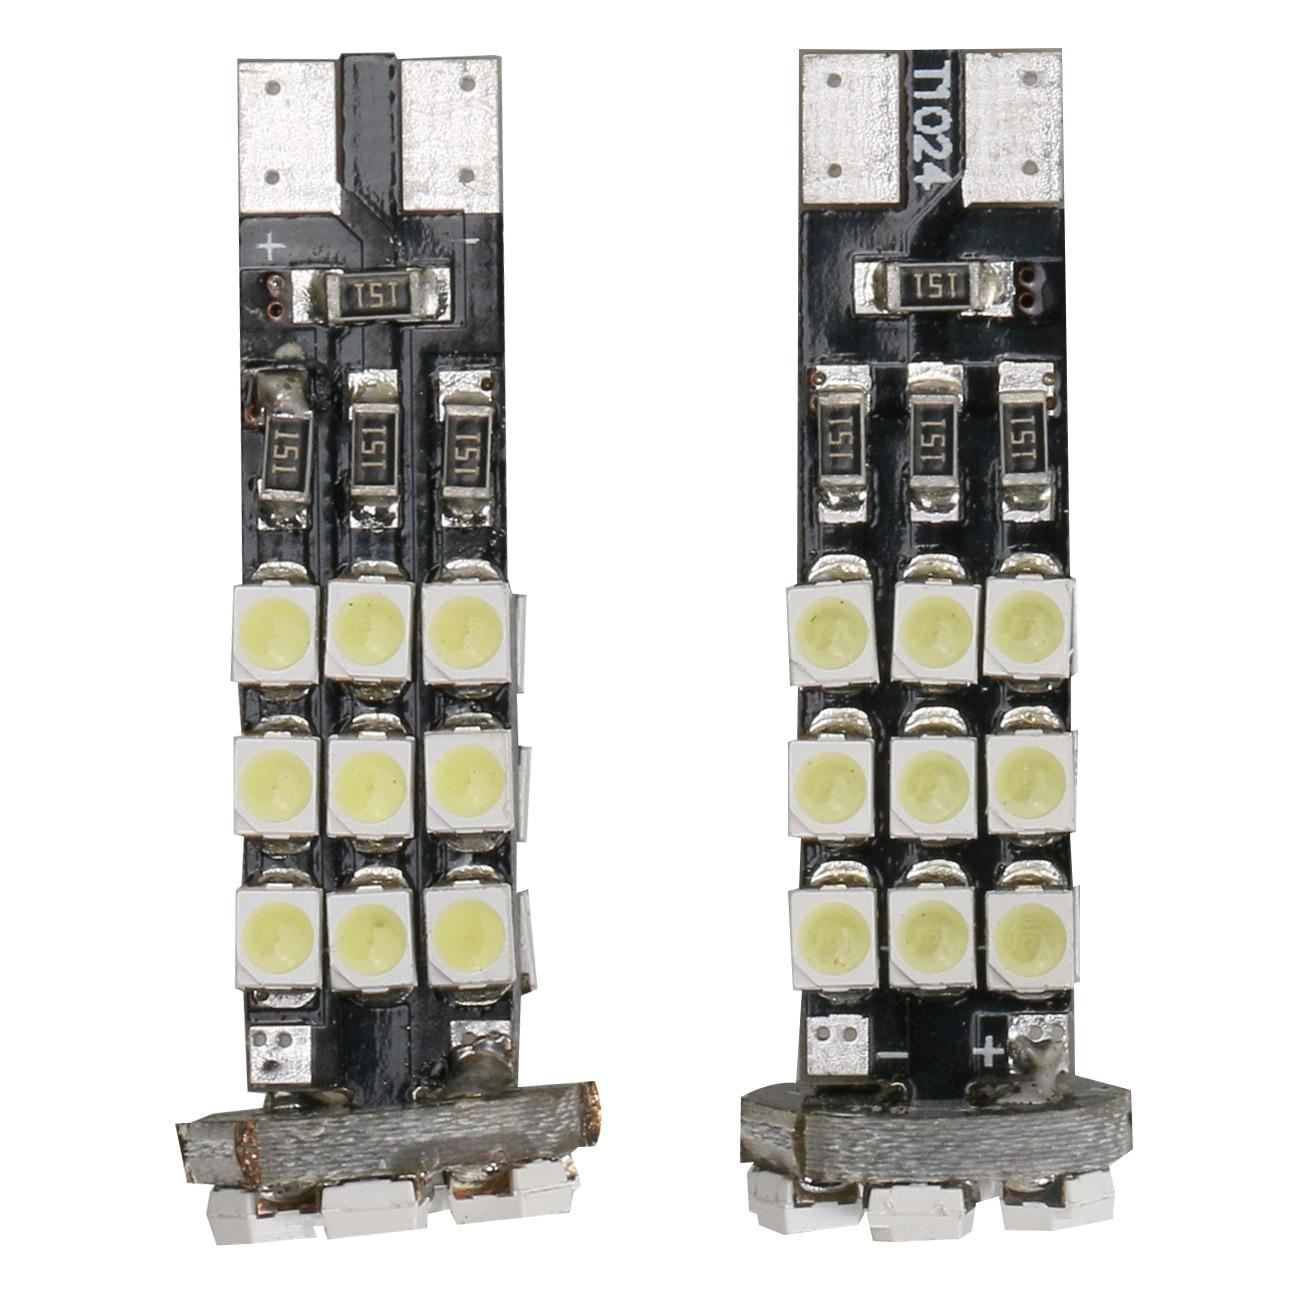 1210 24-SMD LED Bulbs High Power, LED Car Interior,Dashboard Number Plate,Boot Light Lamp 12V